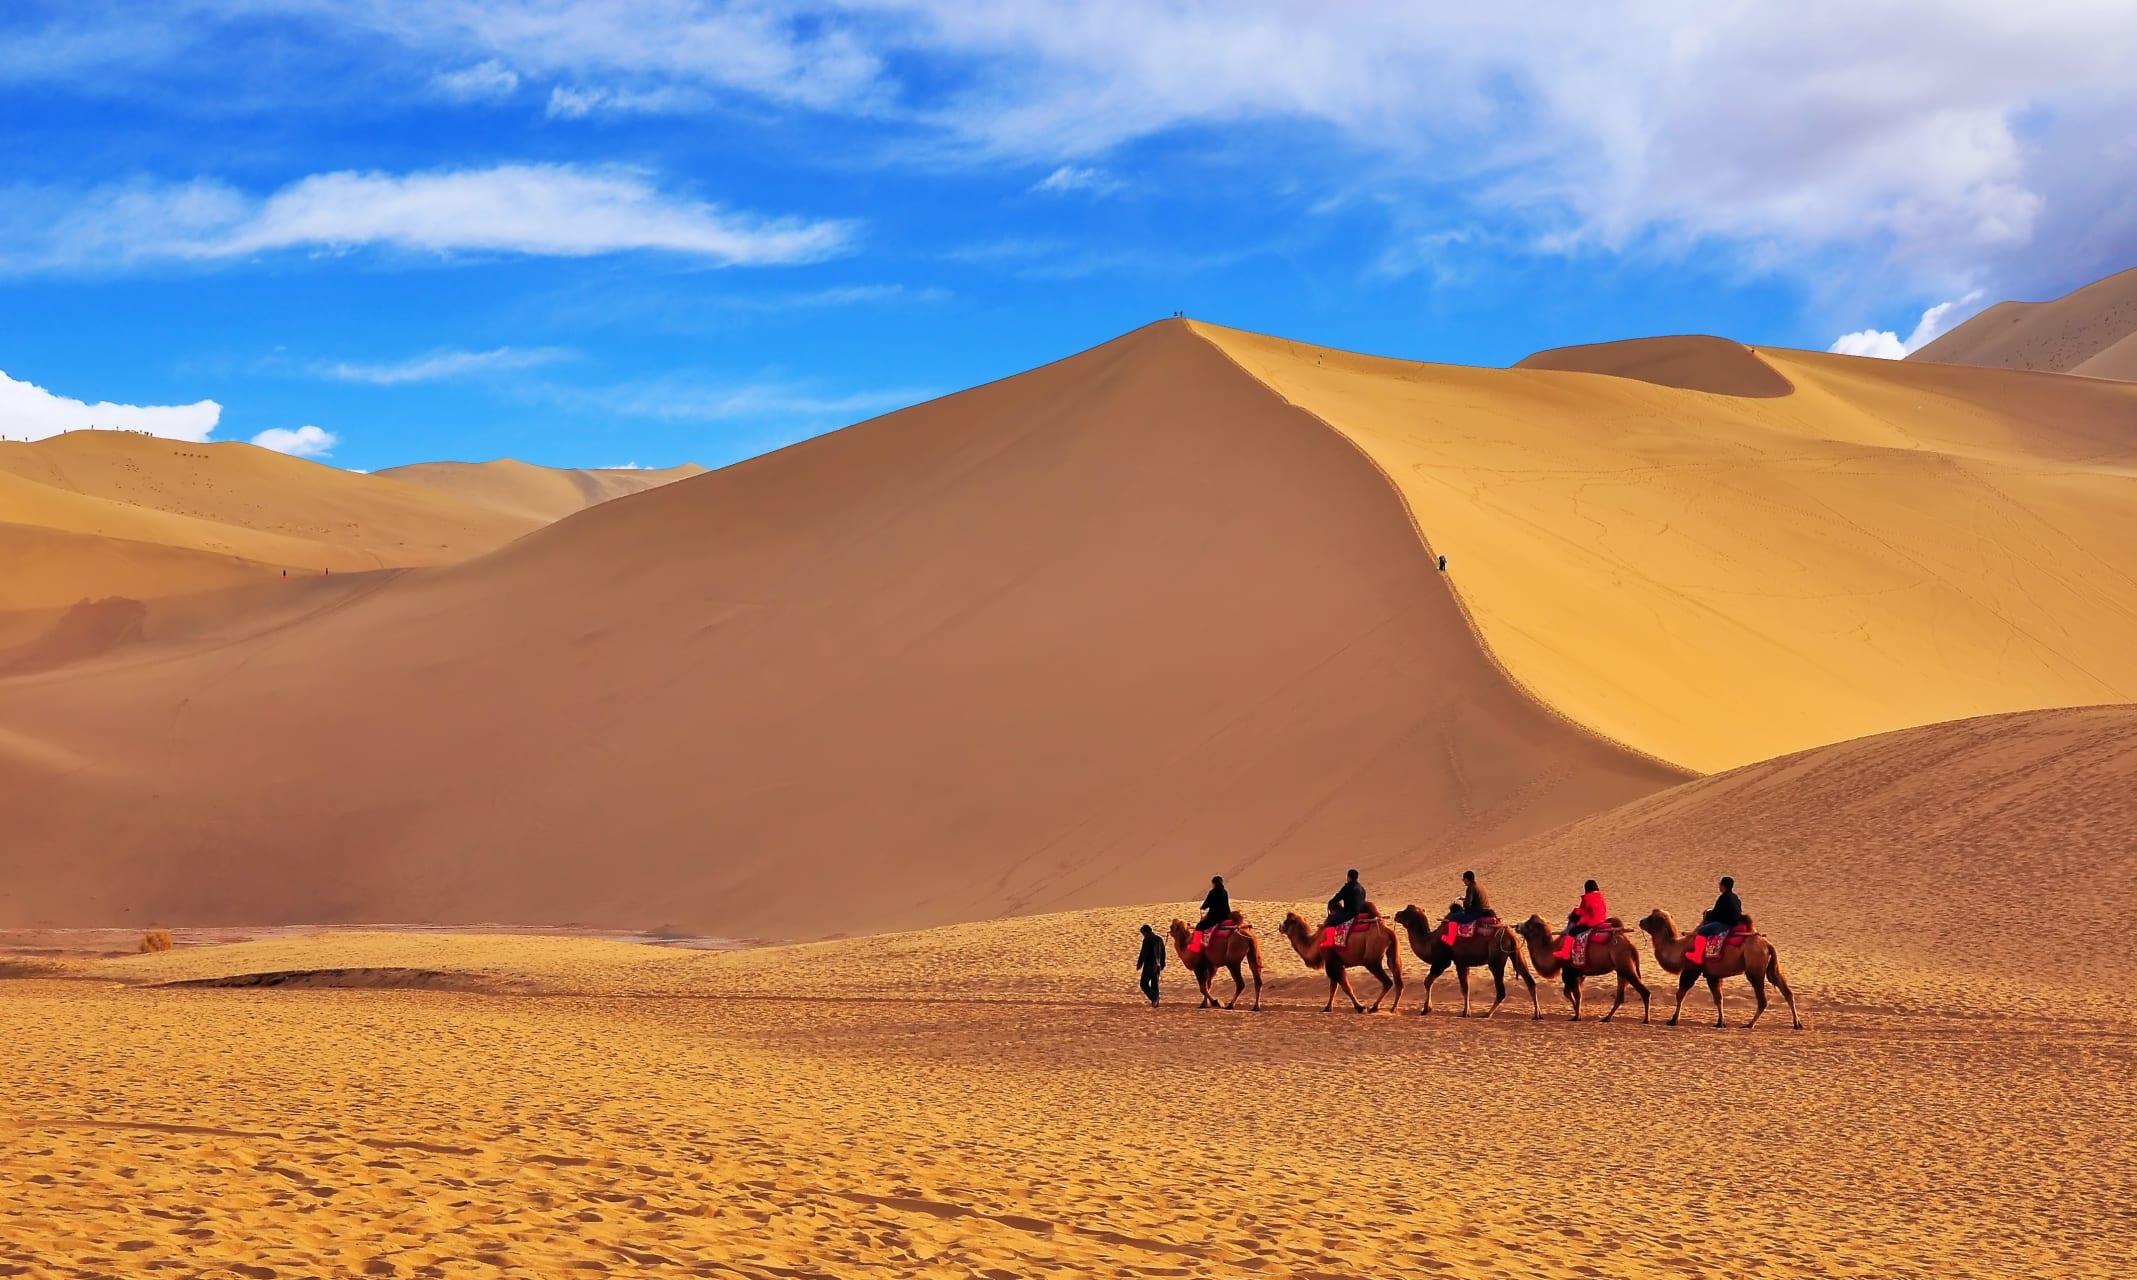 Hexi Corridor (China's Silk Road) - Echoing Sand Dune & Crescent Lake: Silk Road on the Gobi Desert's Edge